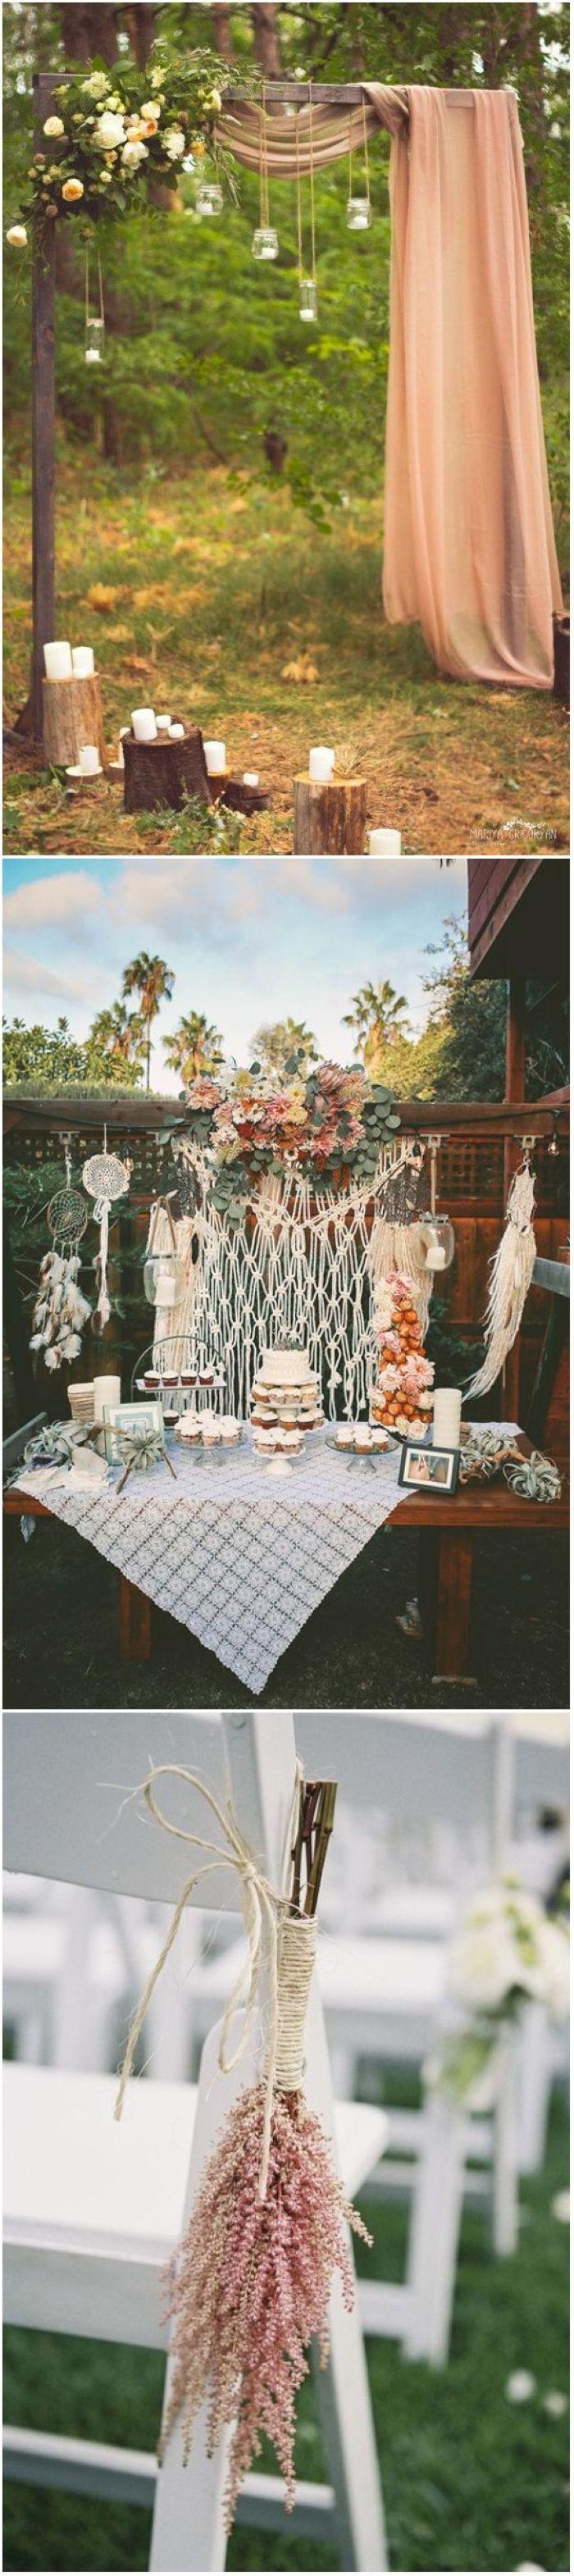 Wedding decoration ideas in the house  nice  Elegant Outdoor Wedding Decor Ideas on A Budget